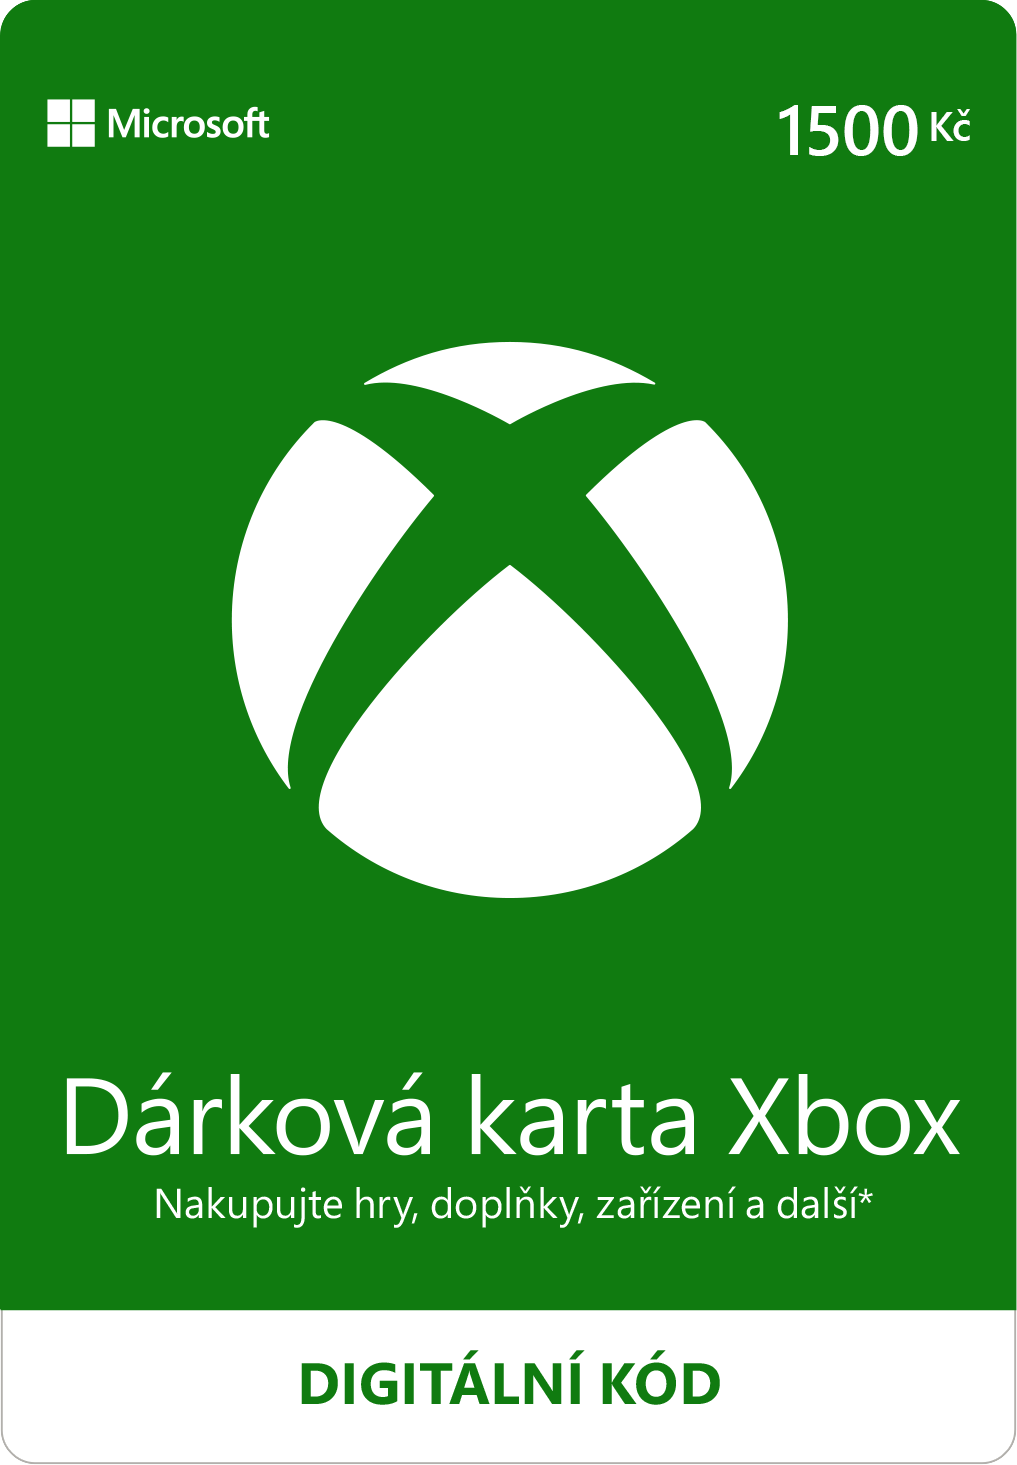 ESD XBOX - Dárková karta Xbox 1500 Kč - K4W-01599